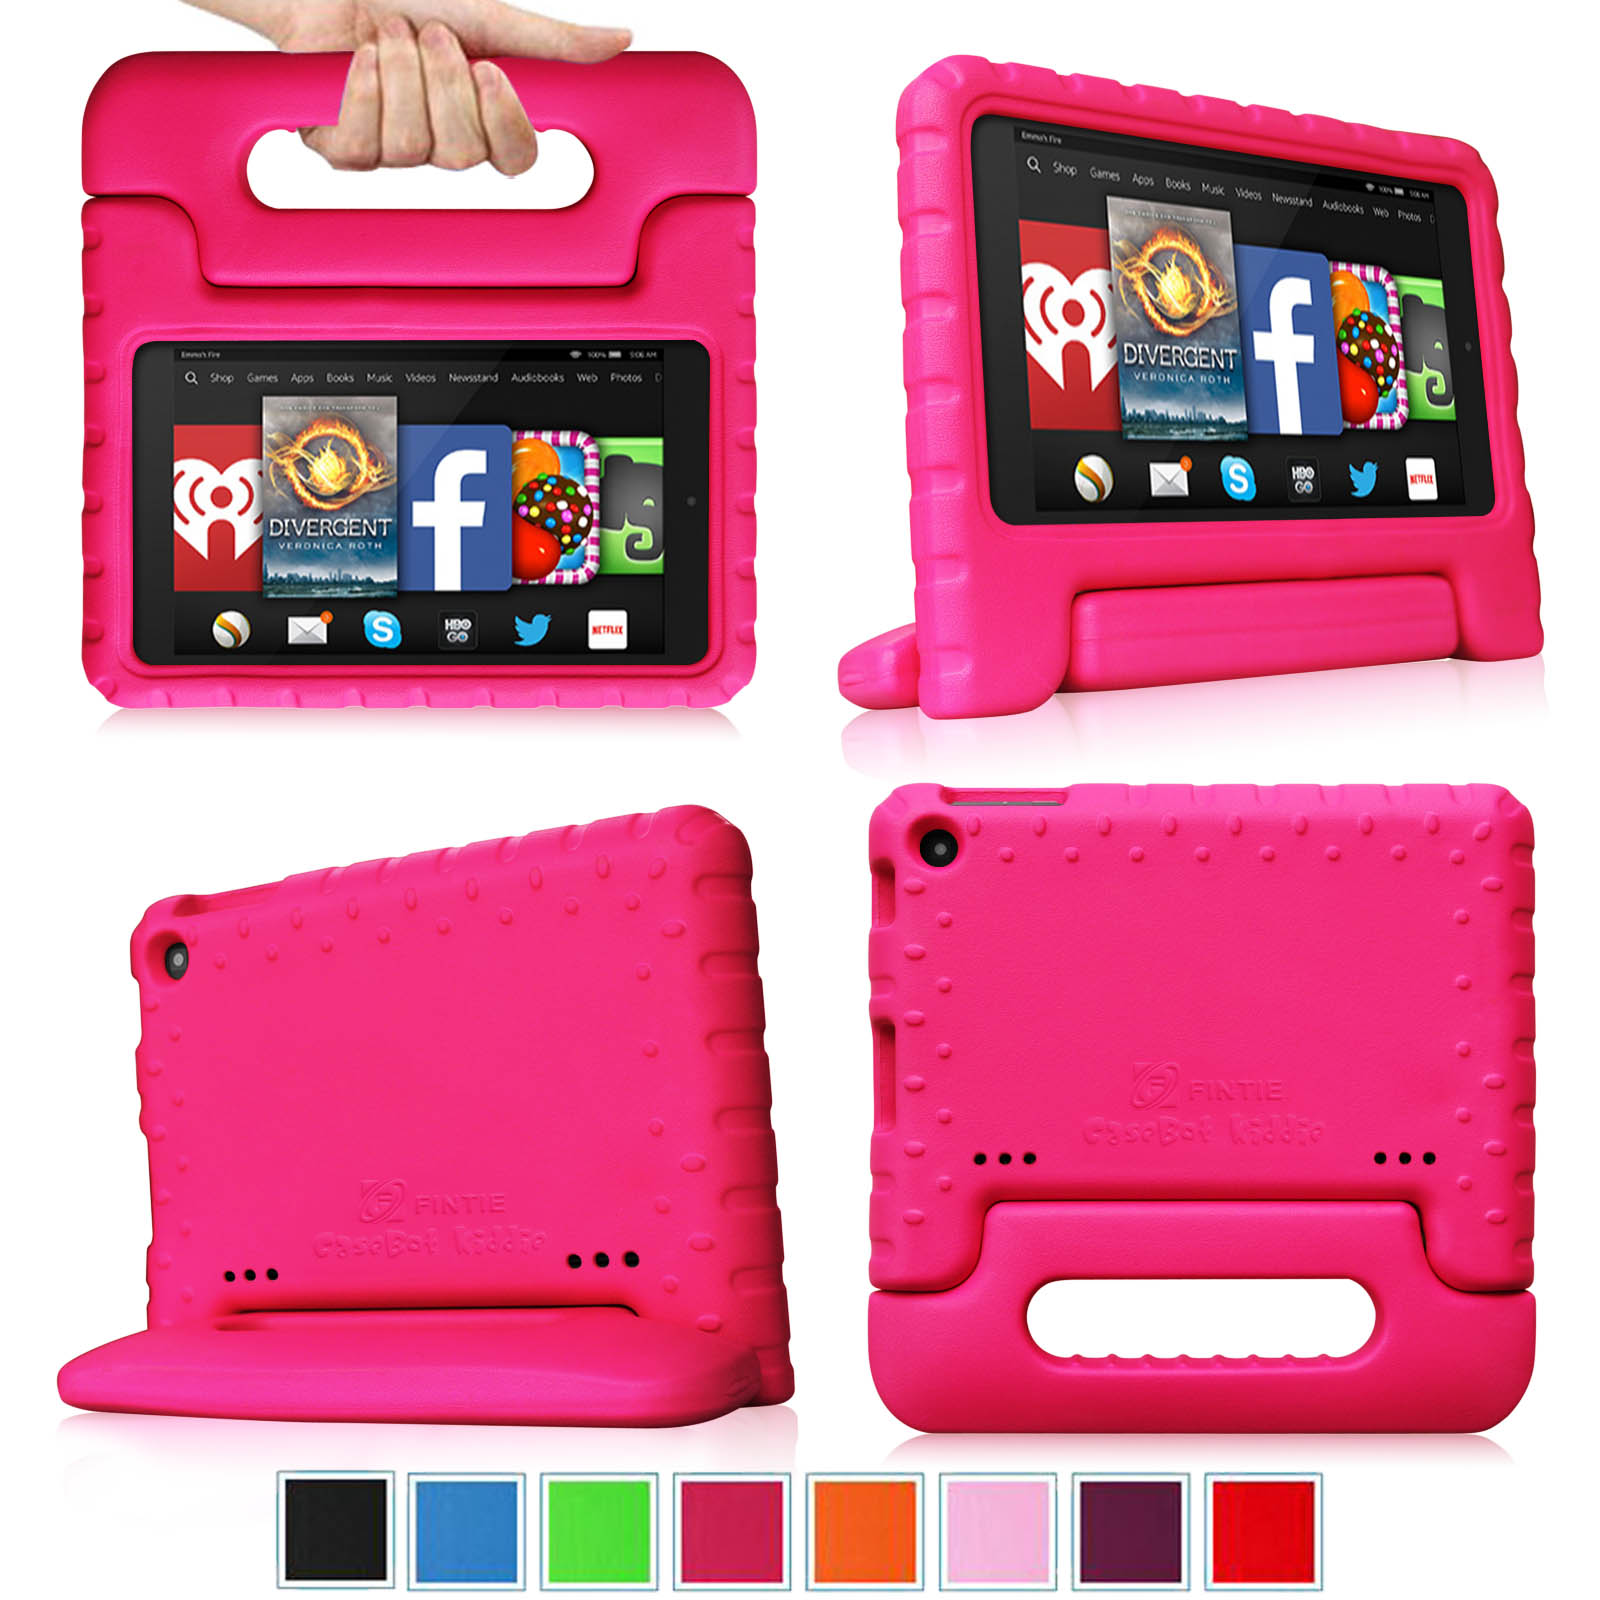 Fintie Kindle Fire HD 7 2014 Oct Release Tablet Kids Case - Lightweight Shock Proof Handle Cover, Magenta